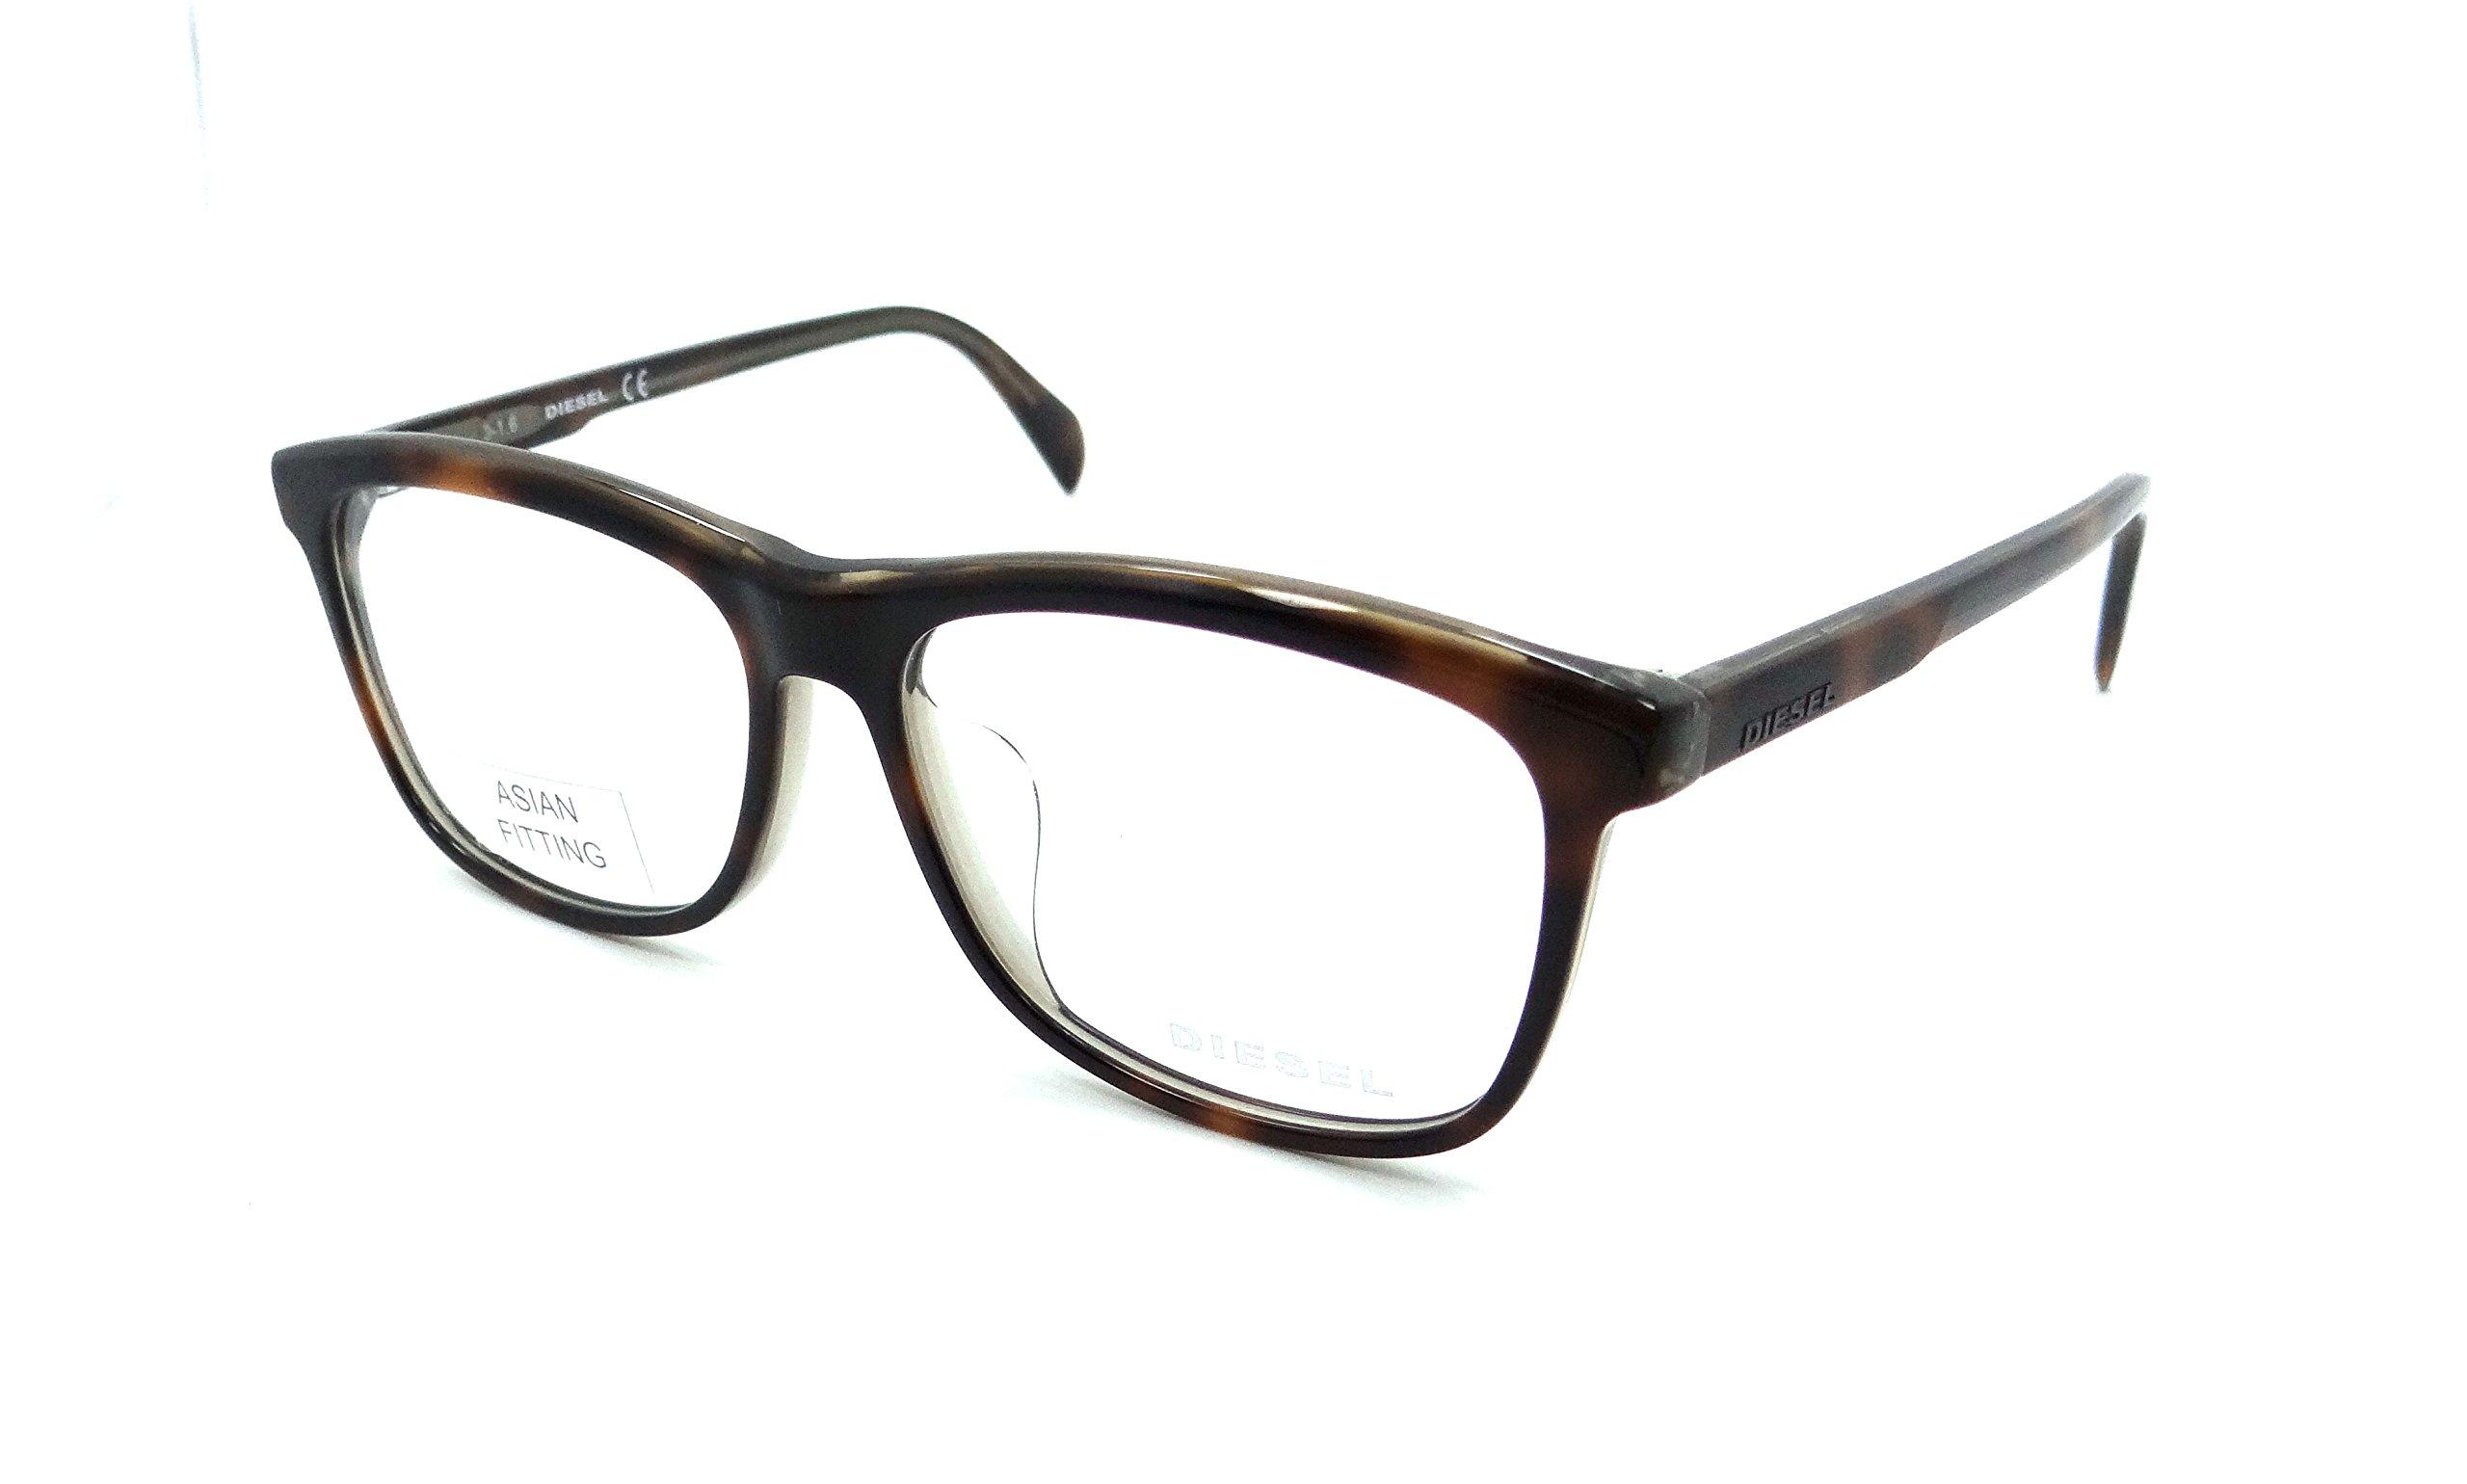 Diesel Rx Eyeglasses Frames DL5183-F 056 54-14-145 Havana Asian Fit